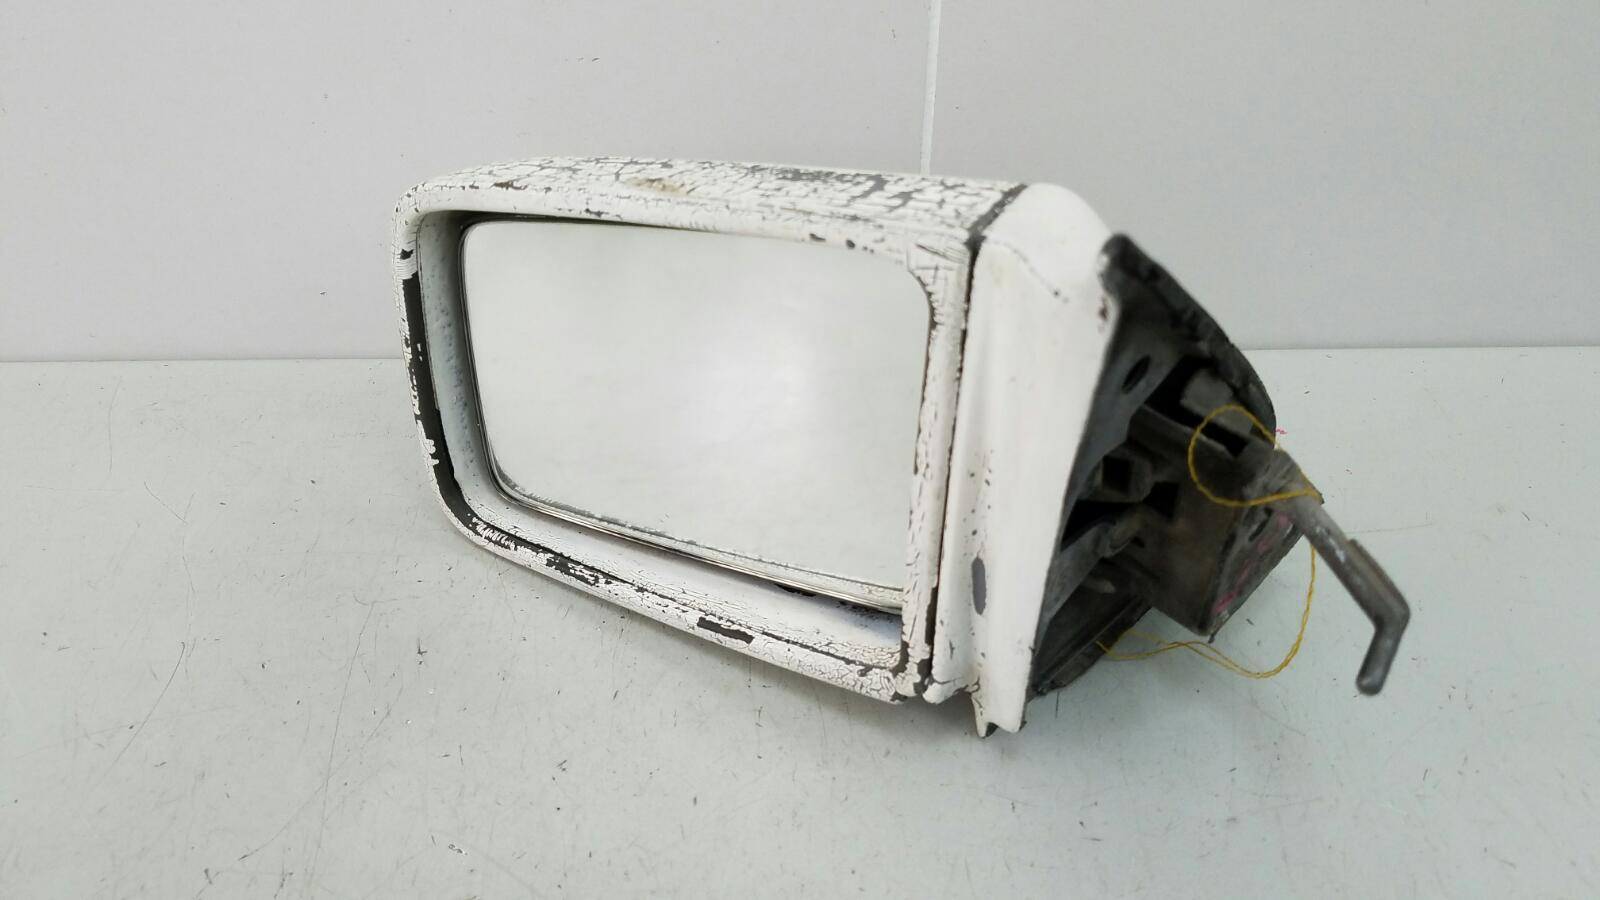 Зеркало Opel Kadet 16D 1.6Л 1985 переднее левое